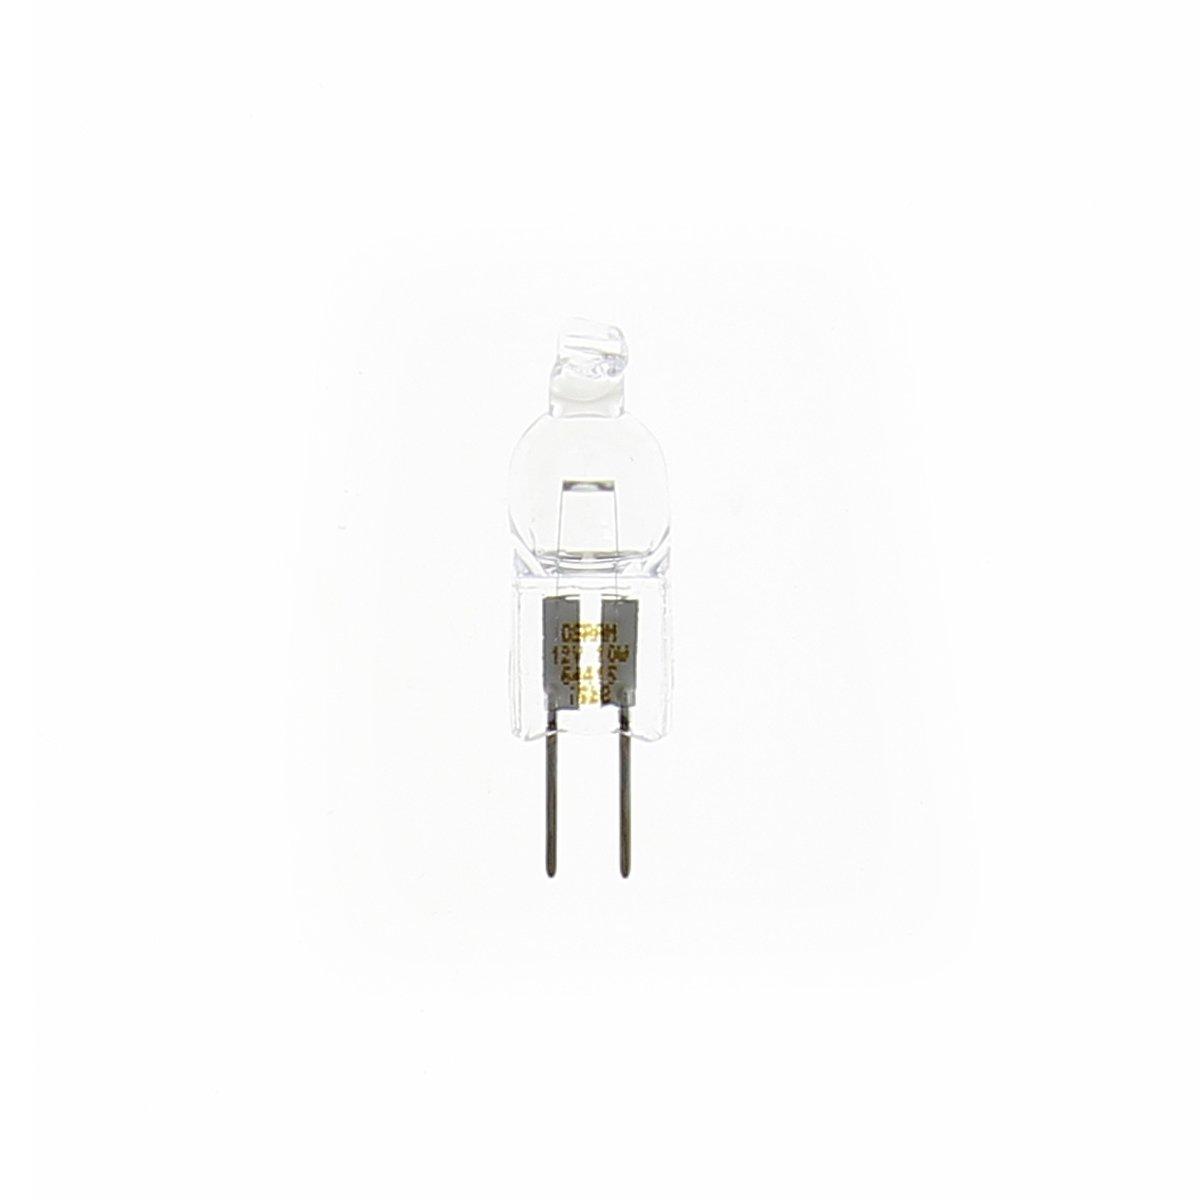 OSRAM Halogen-Stiftsockellampe G4 dimmbar Halostar Superstar / EEK C / 12Volt / 10 Watt / 140 Lumen / warmweiß - 2800K, 10er Pack 64415